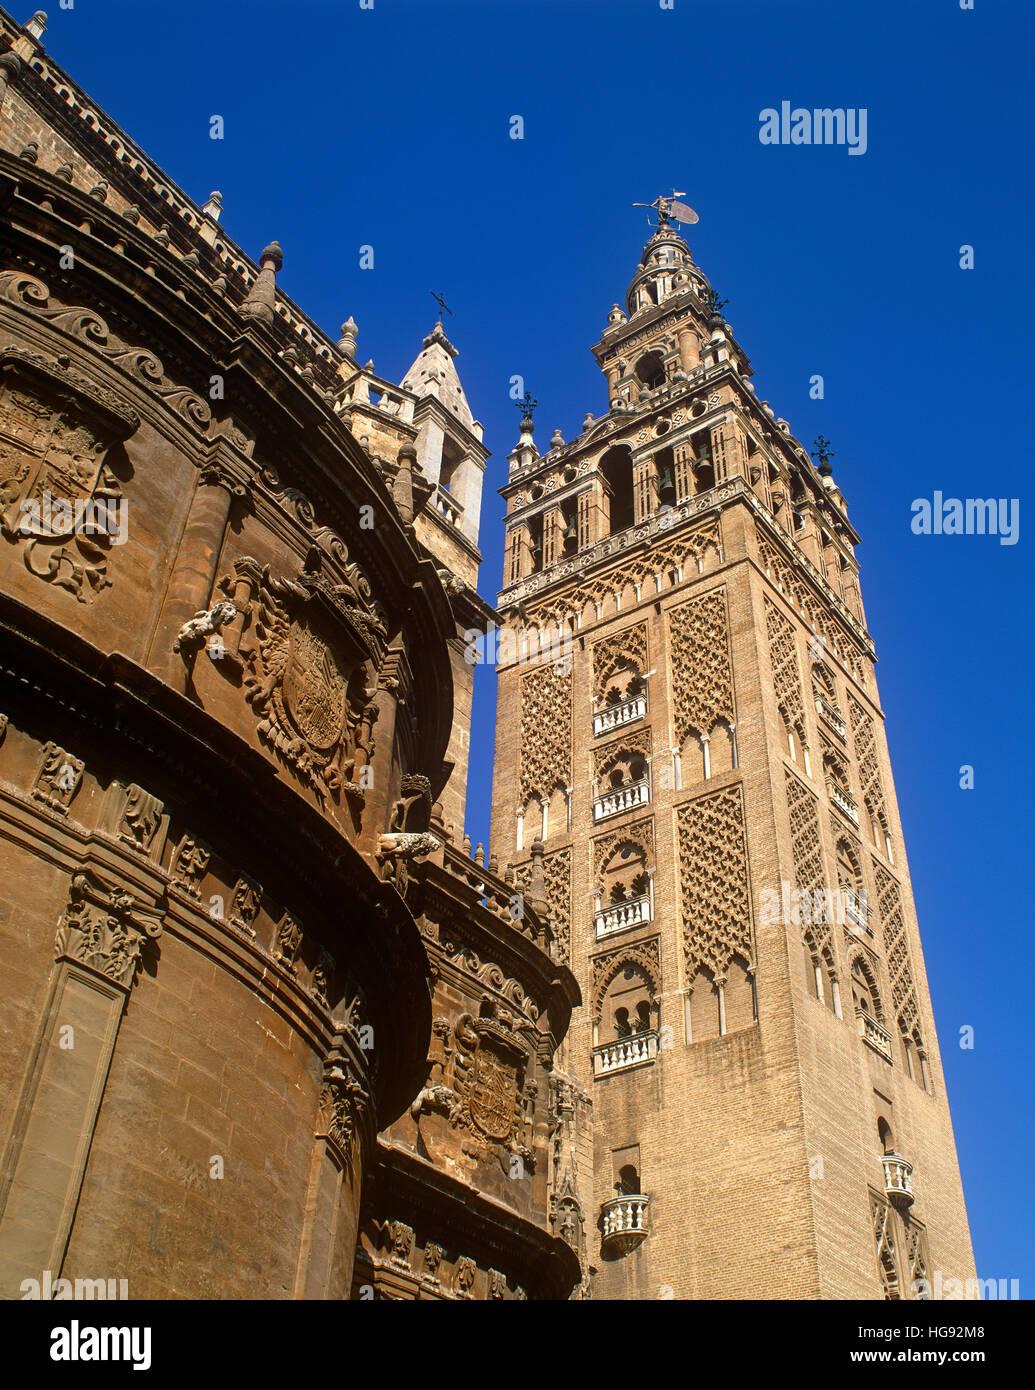 Die Giralda Turm, Sevilla, Andalusien, Spanien Stockbild